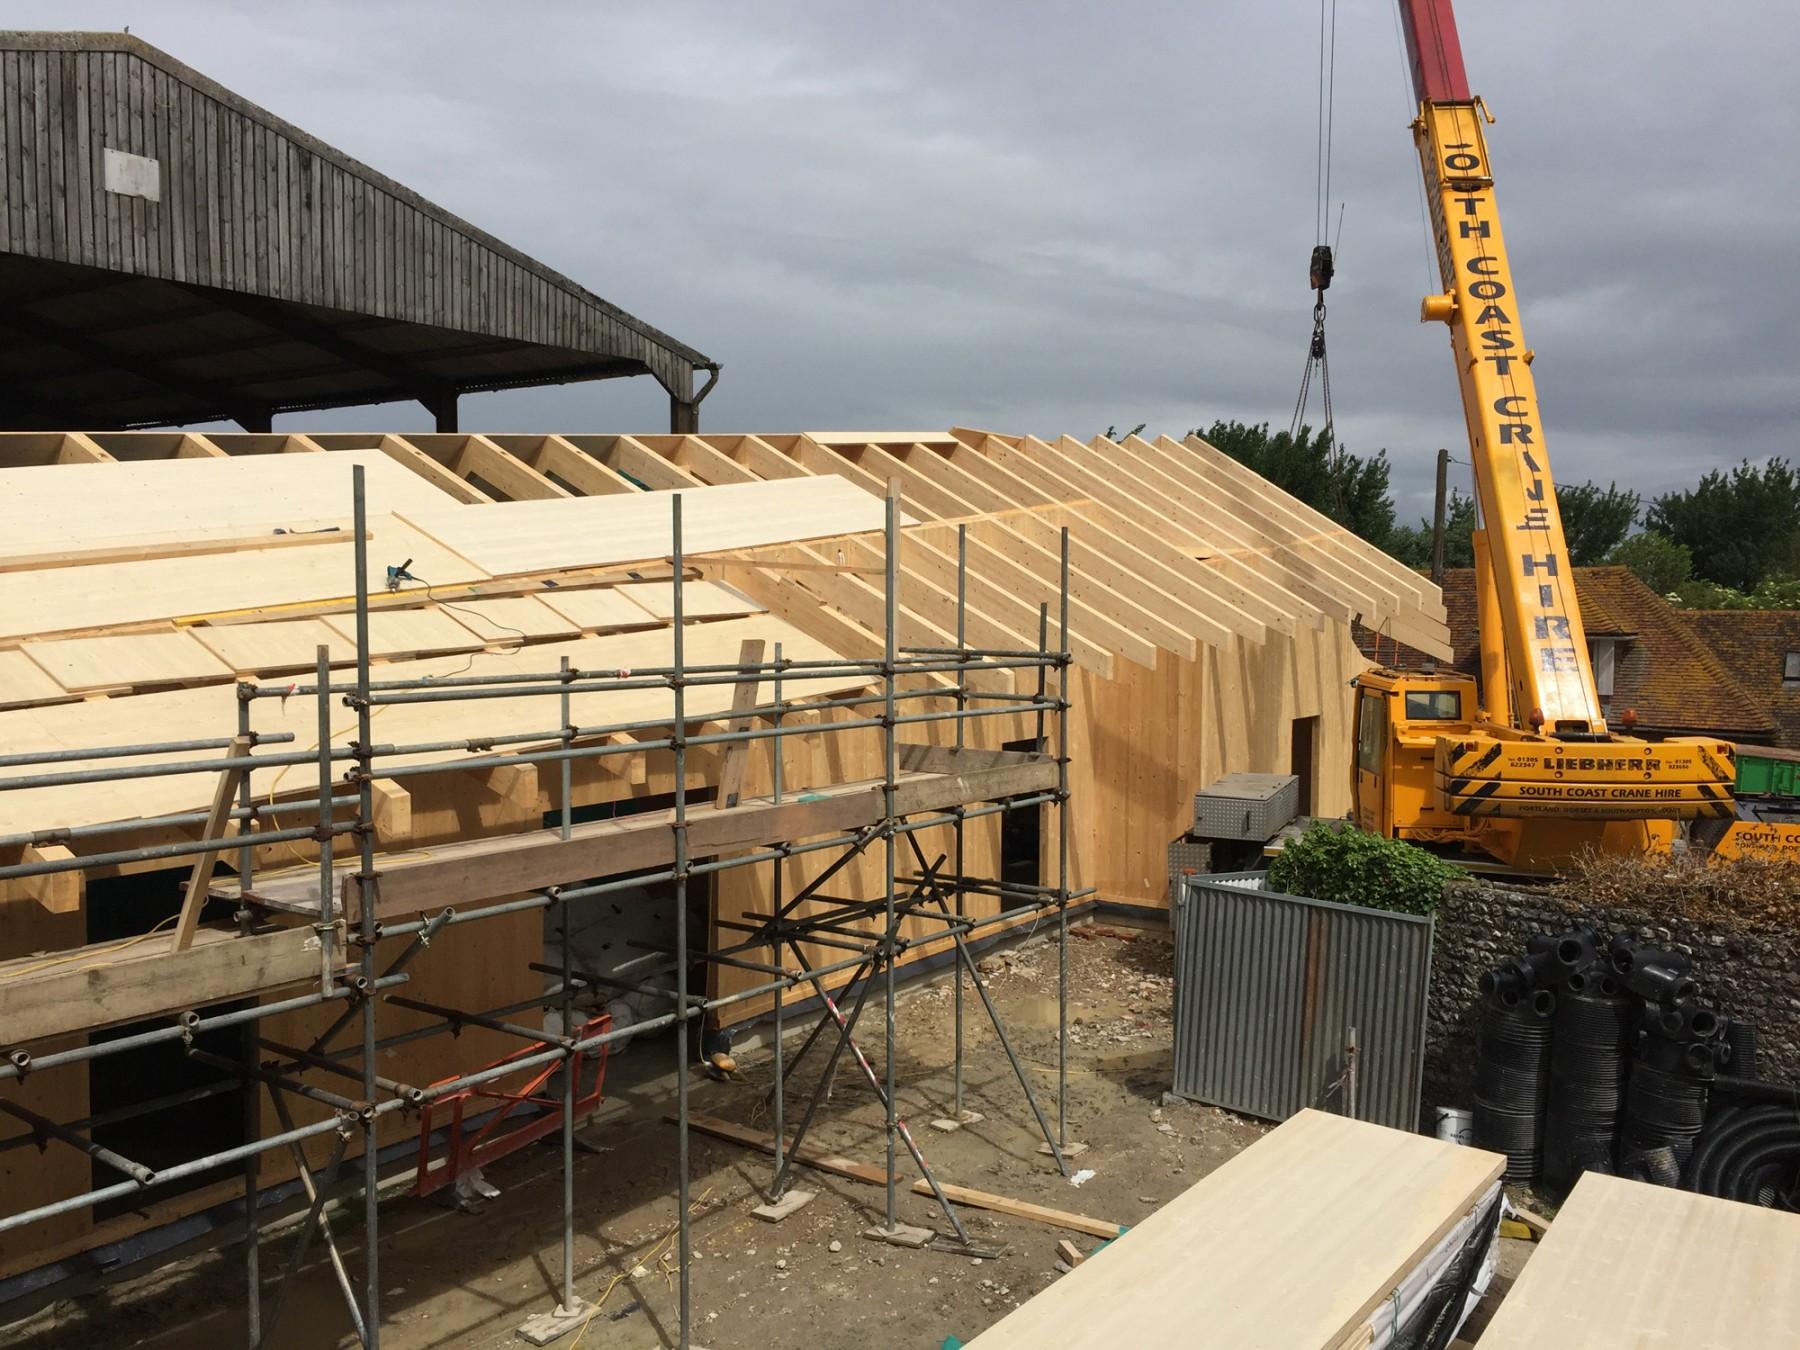 charleston-centenary-project-jamie-fobert-architects-wooden-construction